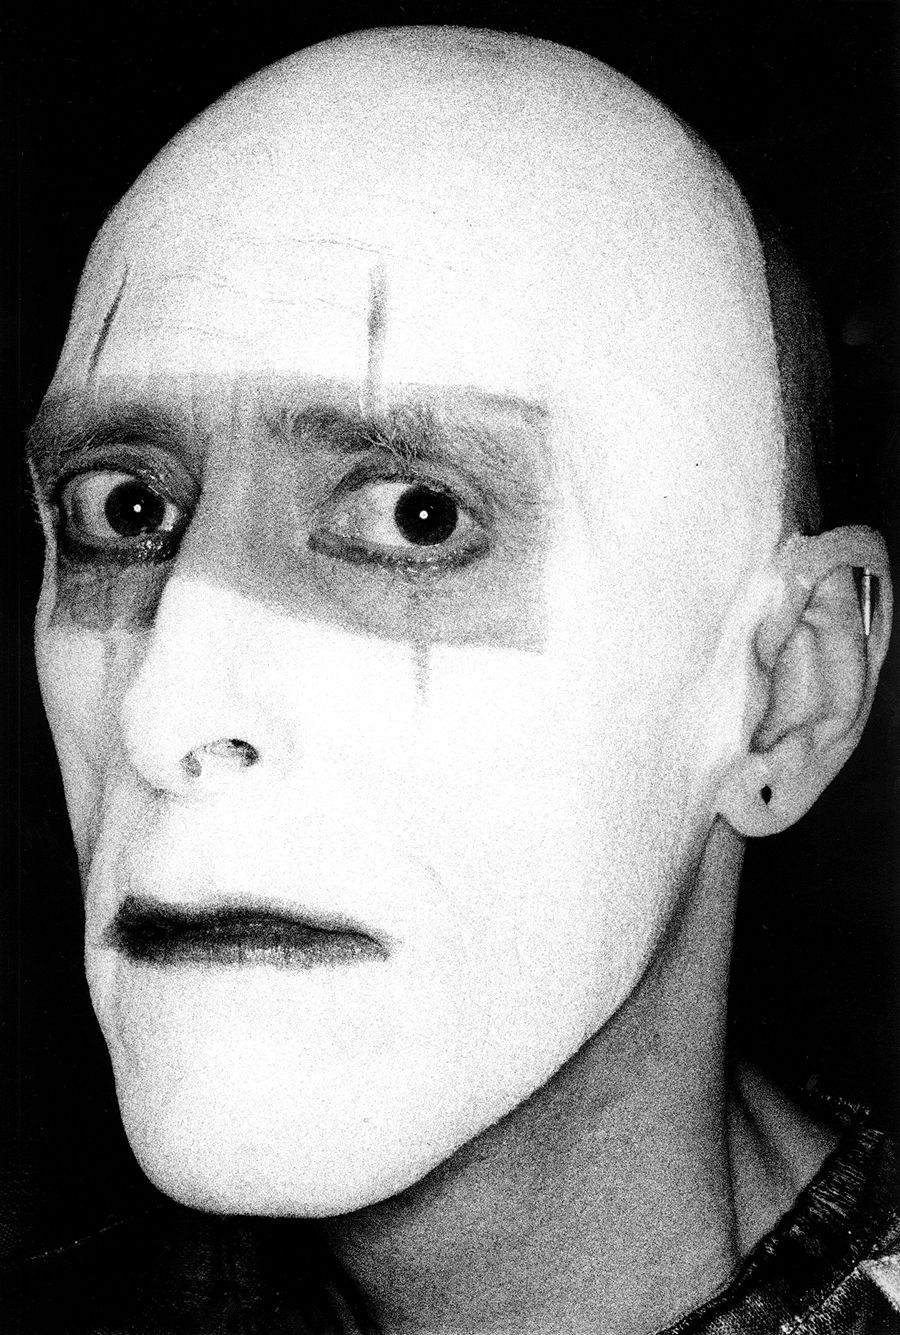 med-Tony_Ward_photography_wasteland_project_fetish_party_amsterdam_netherlands_sad_clown_face